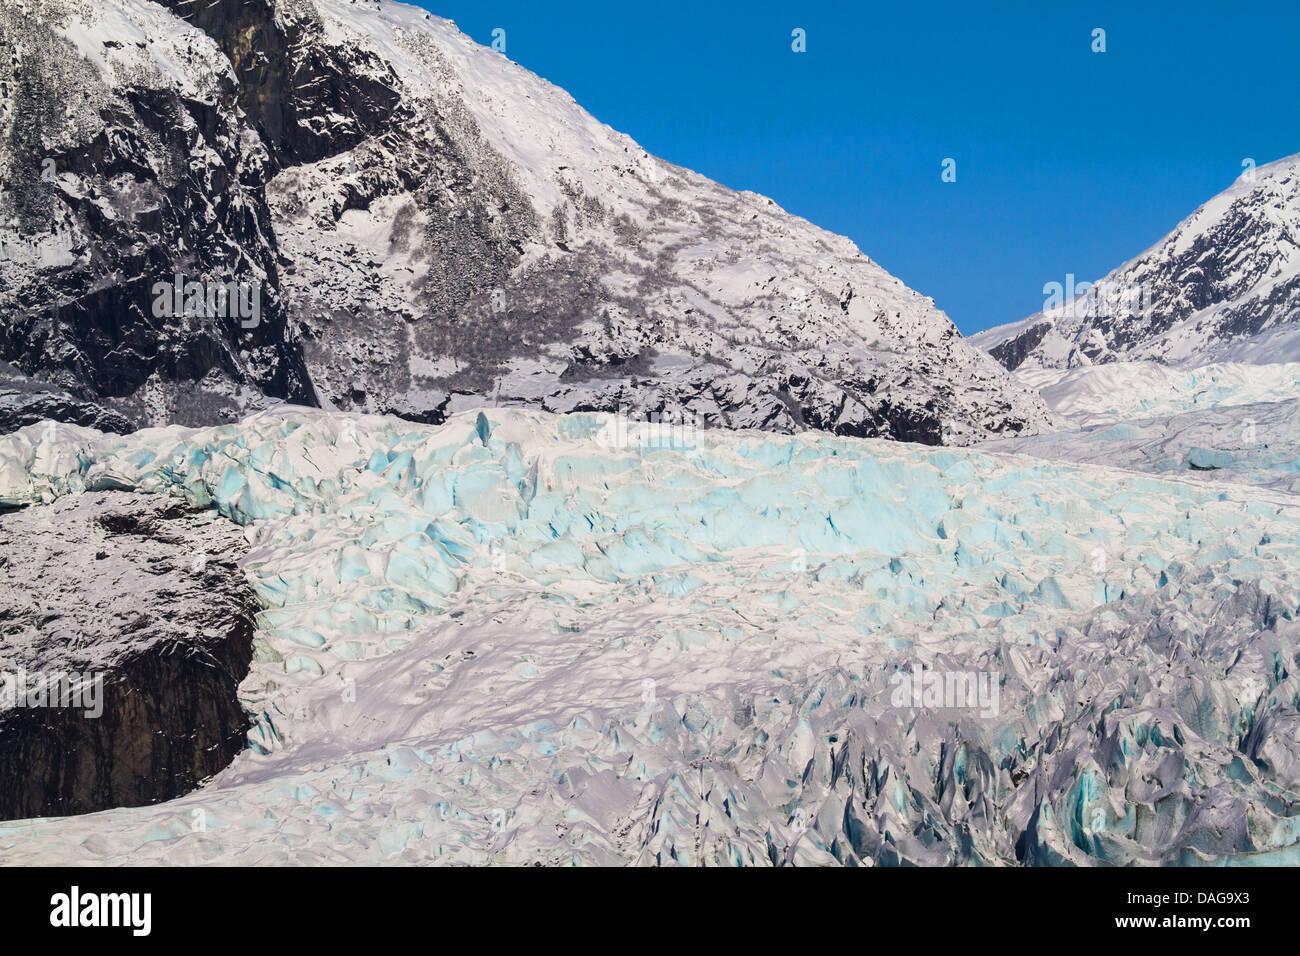 Mendenhall glacier, USA, Alaska, Juneau - Stock Image